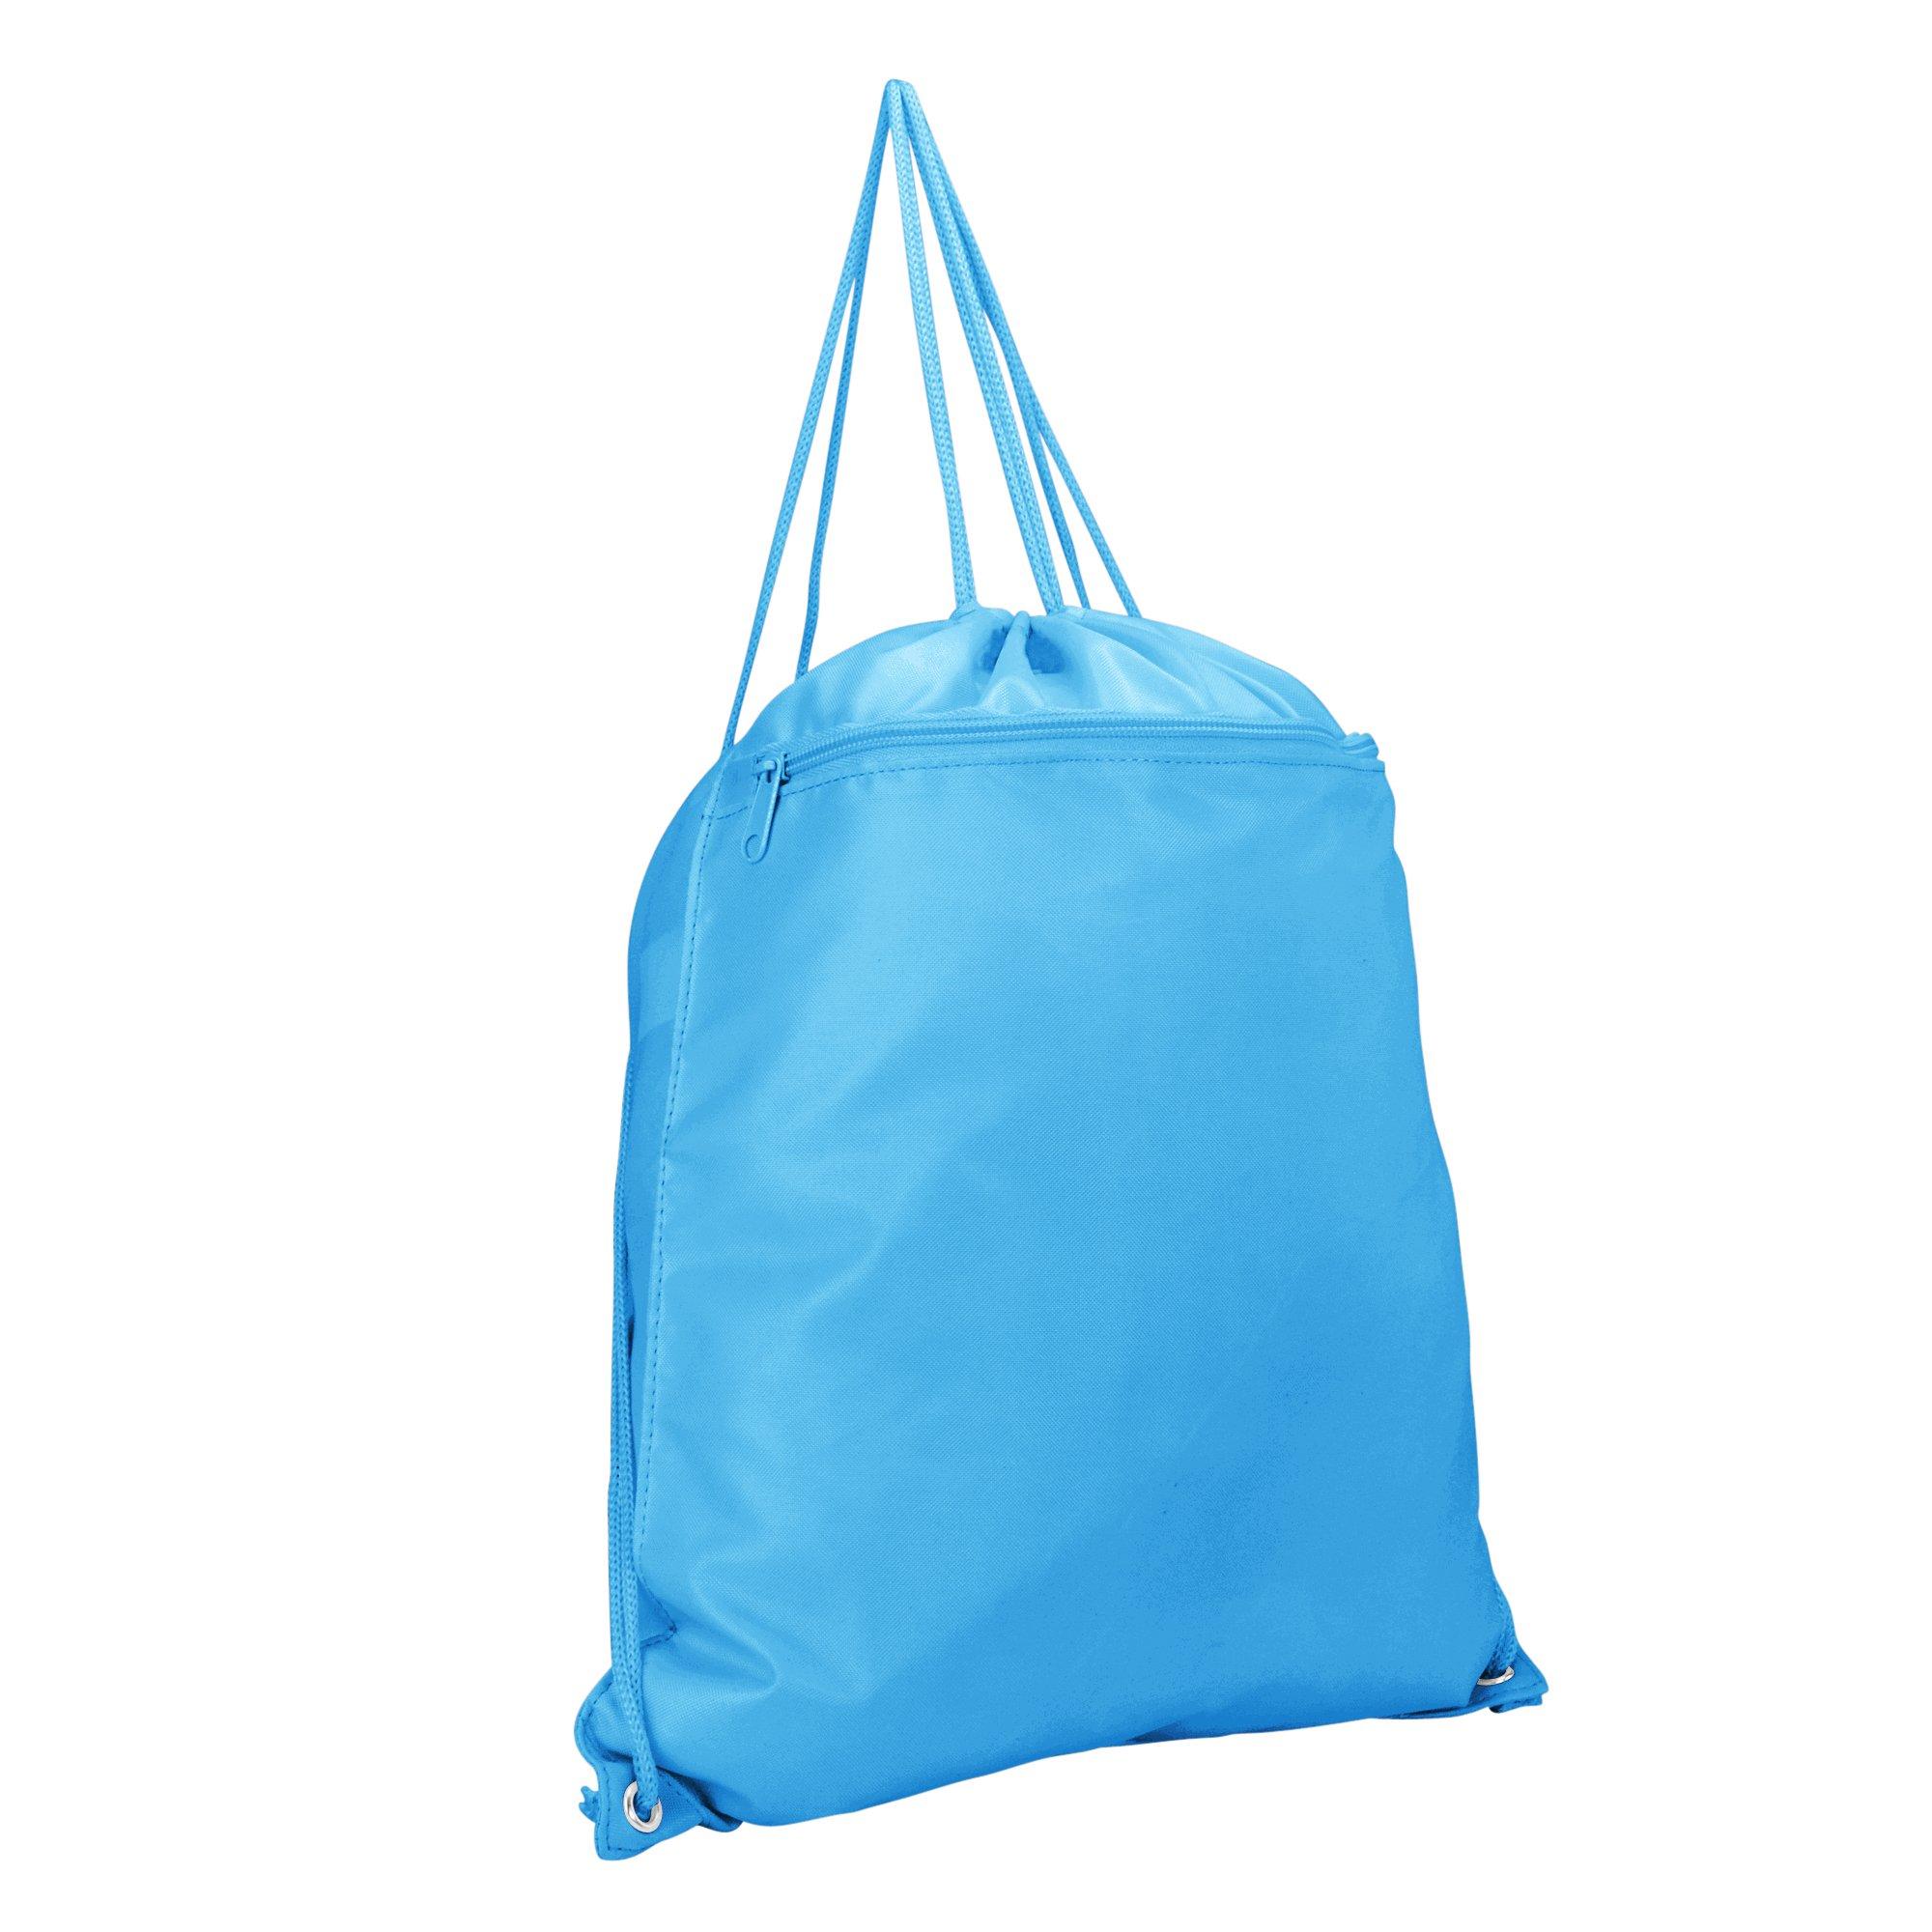 DALIX Drawstring Backpack Sack Bag Light Baby Blue